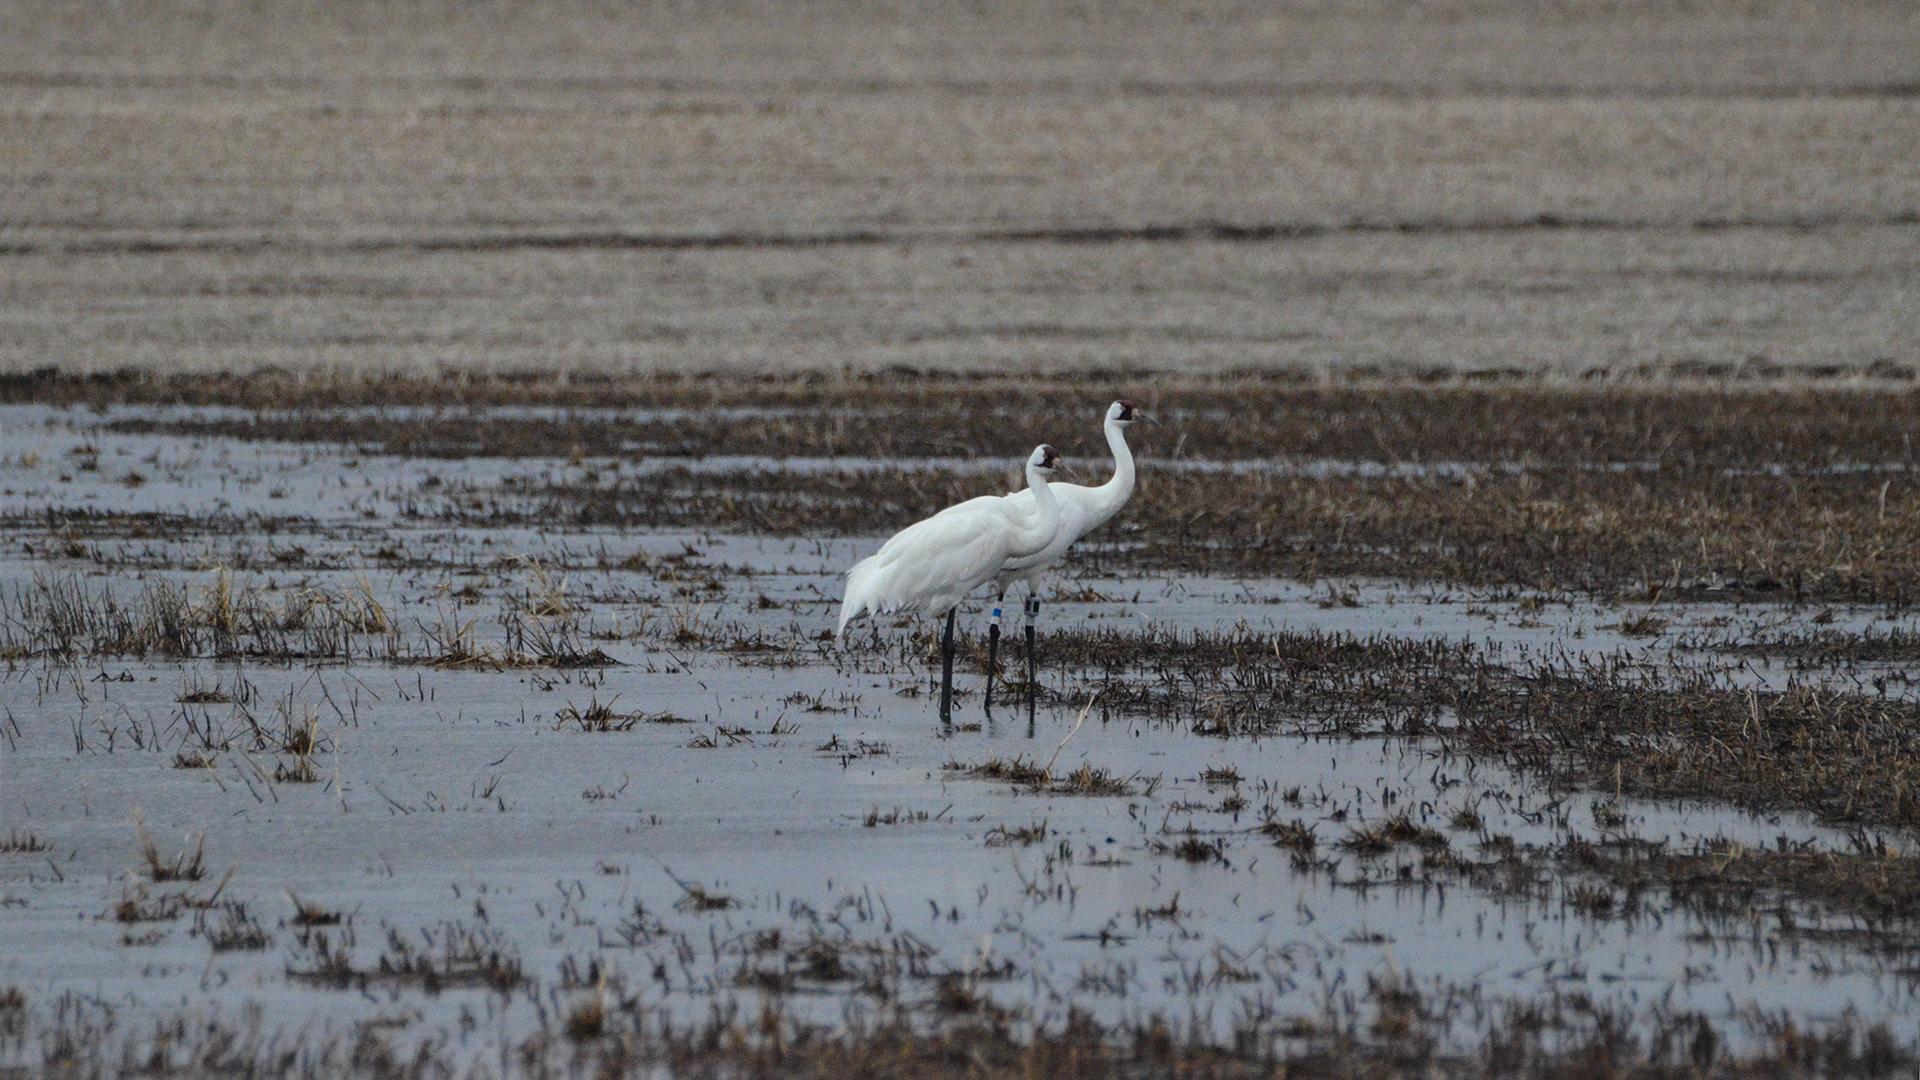 Whooping Cranes wade in wetlands water